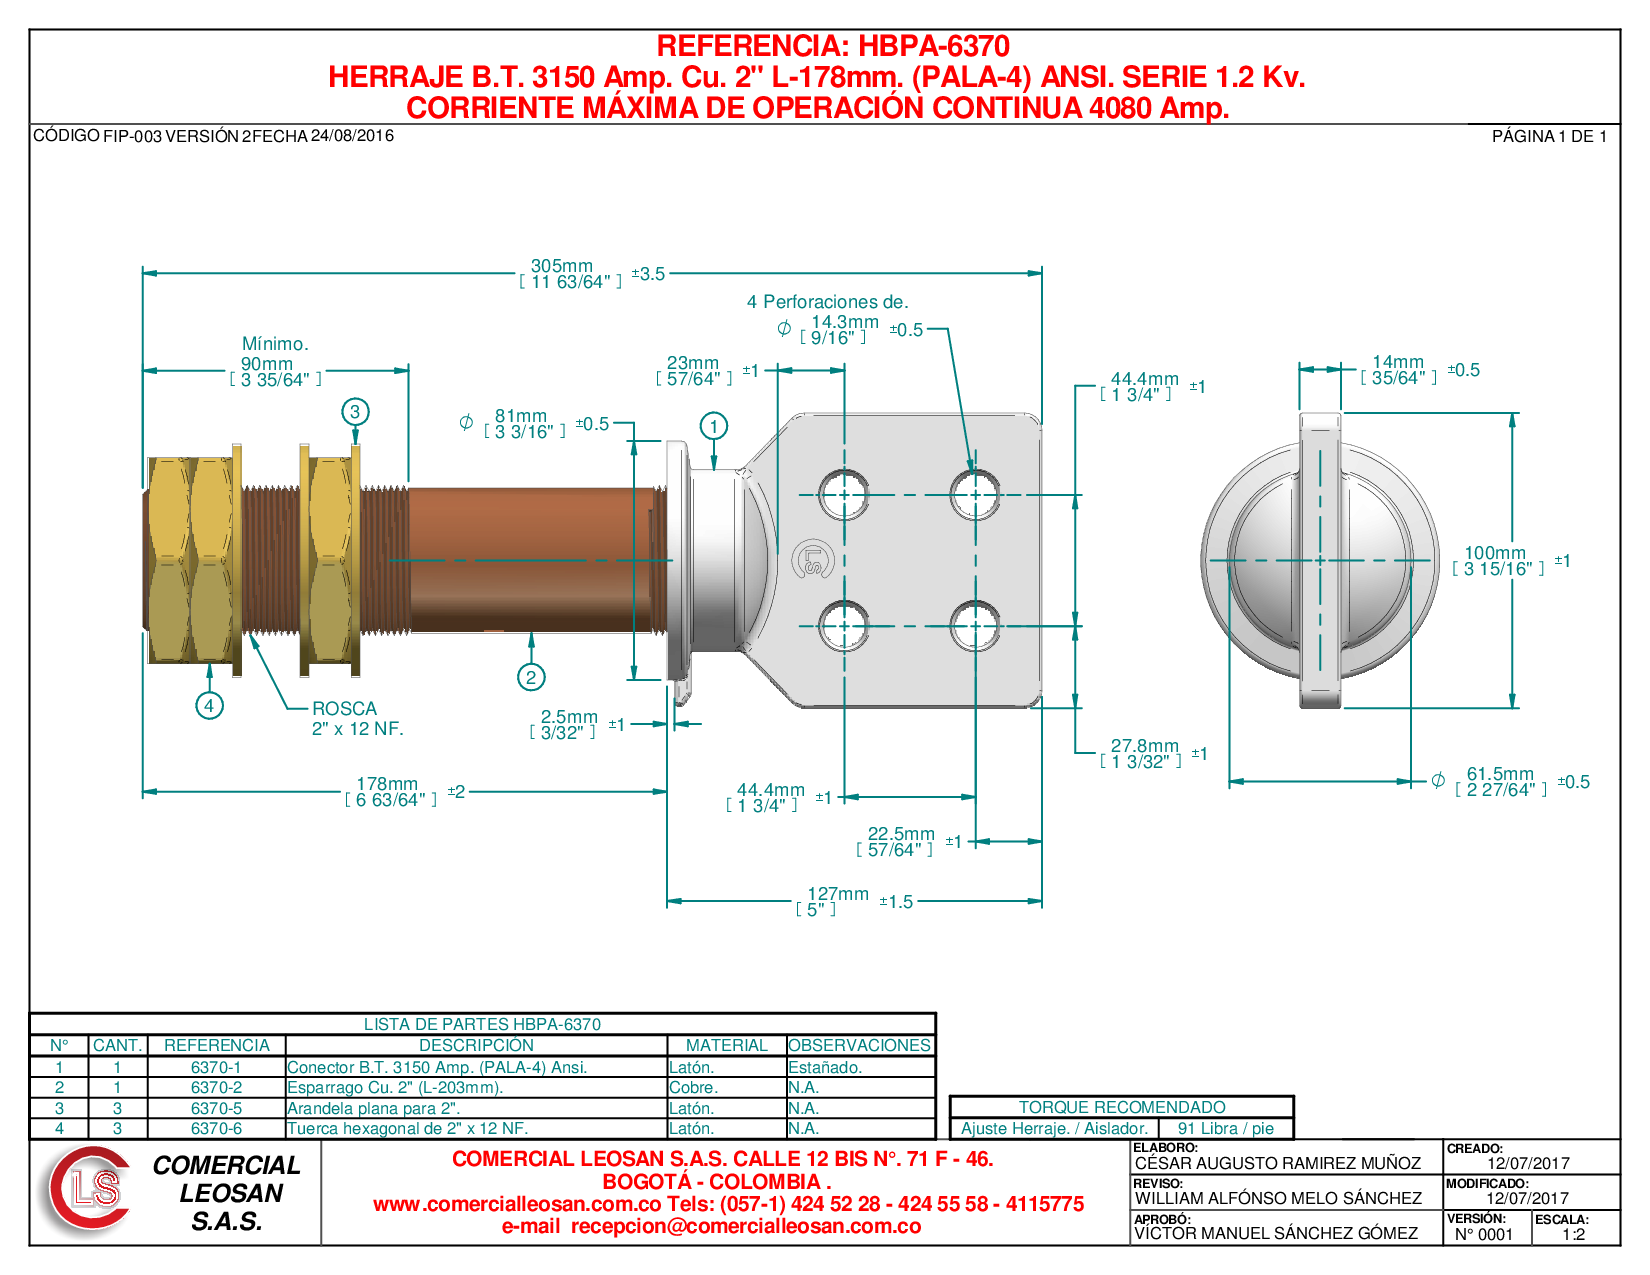 "HERRAJE B.T. 3150 Amp. Cu. 2"" L-178mm. (PALA-4) ANSI. SERIE 1.2 Kv."